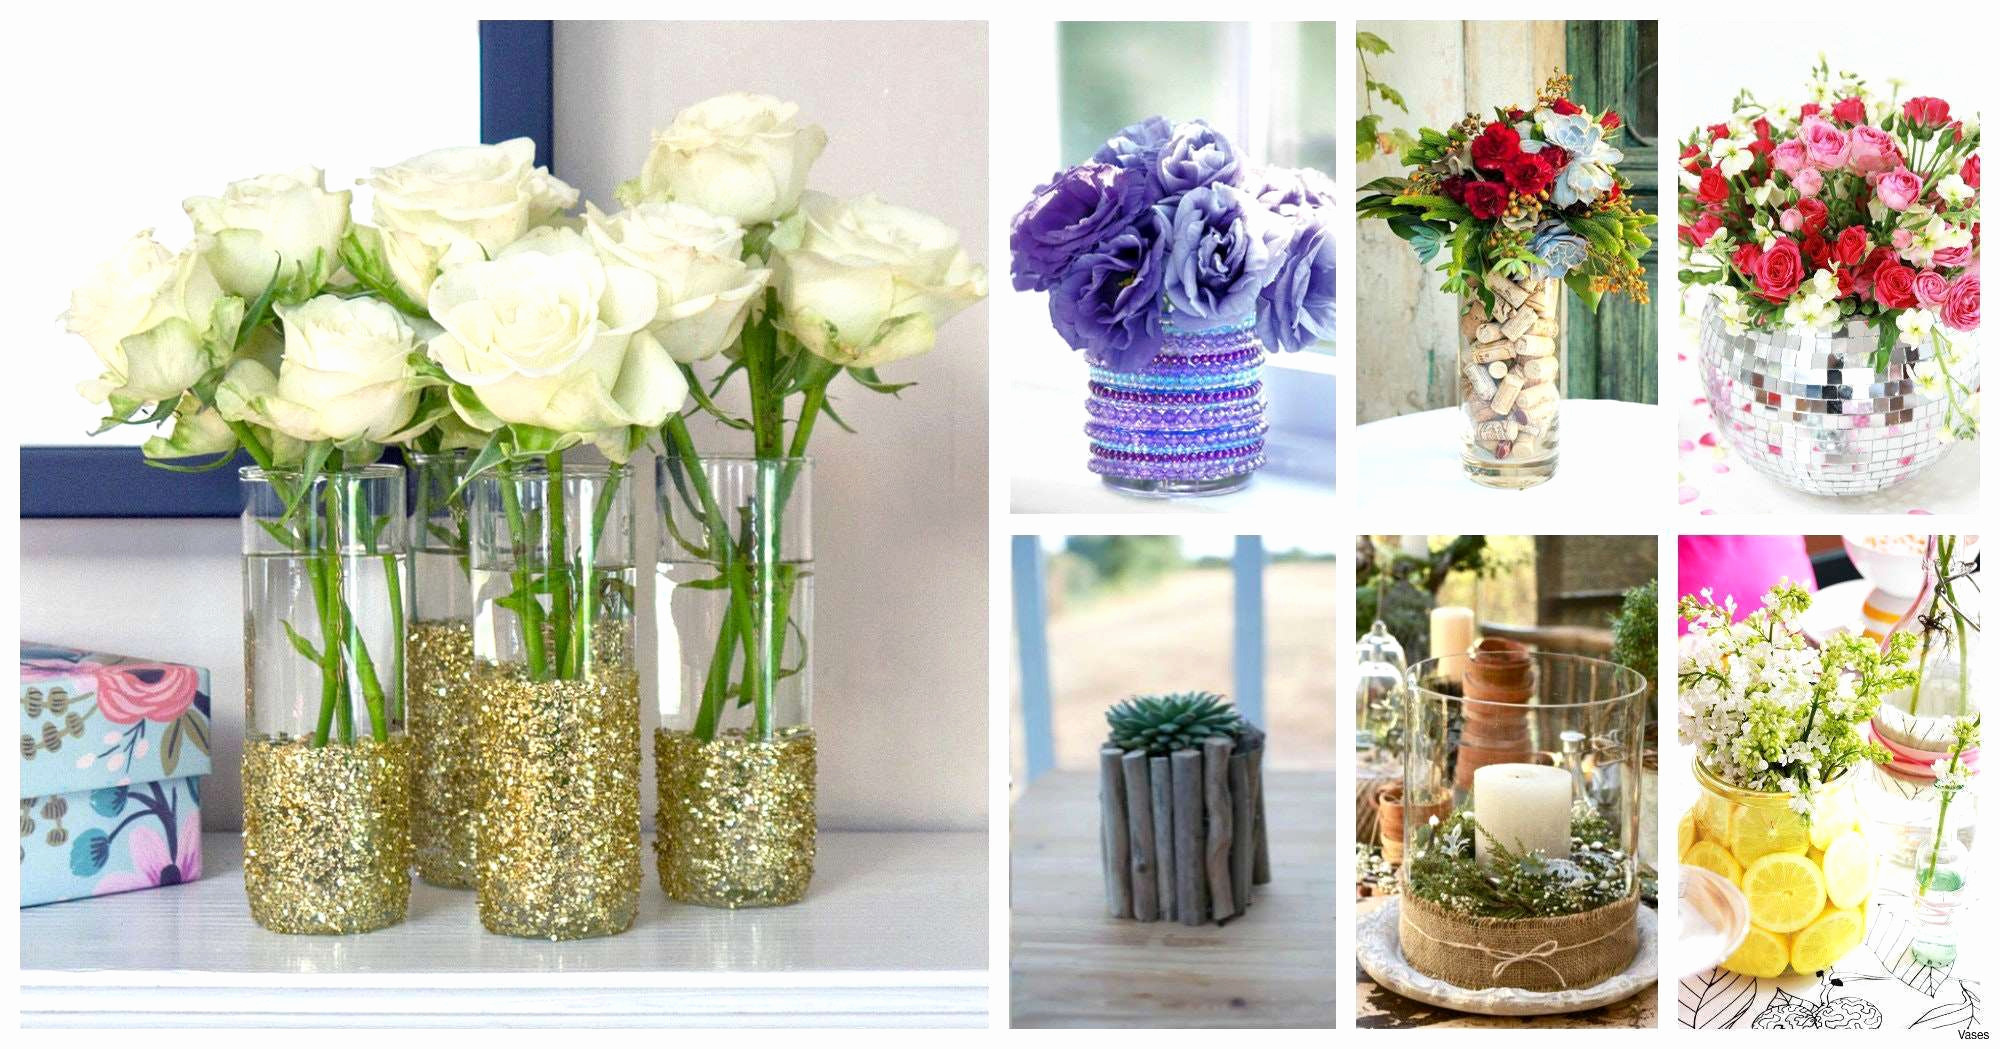 cheap ikebana vases of wedding table flower arrangement elegant wedding wedding flower for wedding table flower arrangement lovely dsc h vases square centerpiece dsc i 0d cheap ideas with